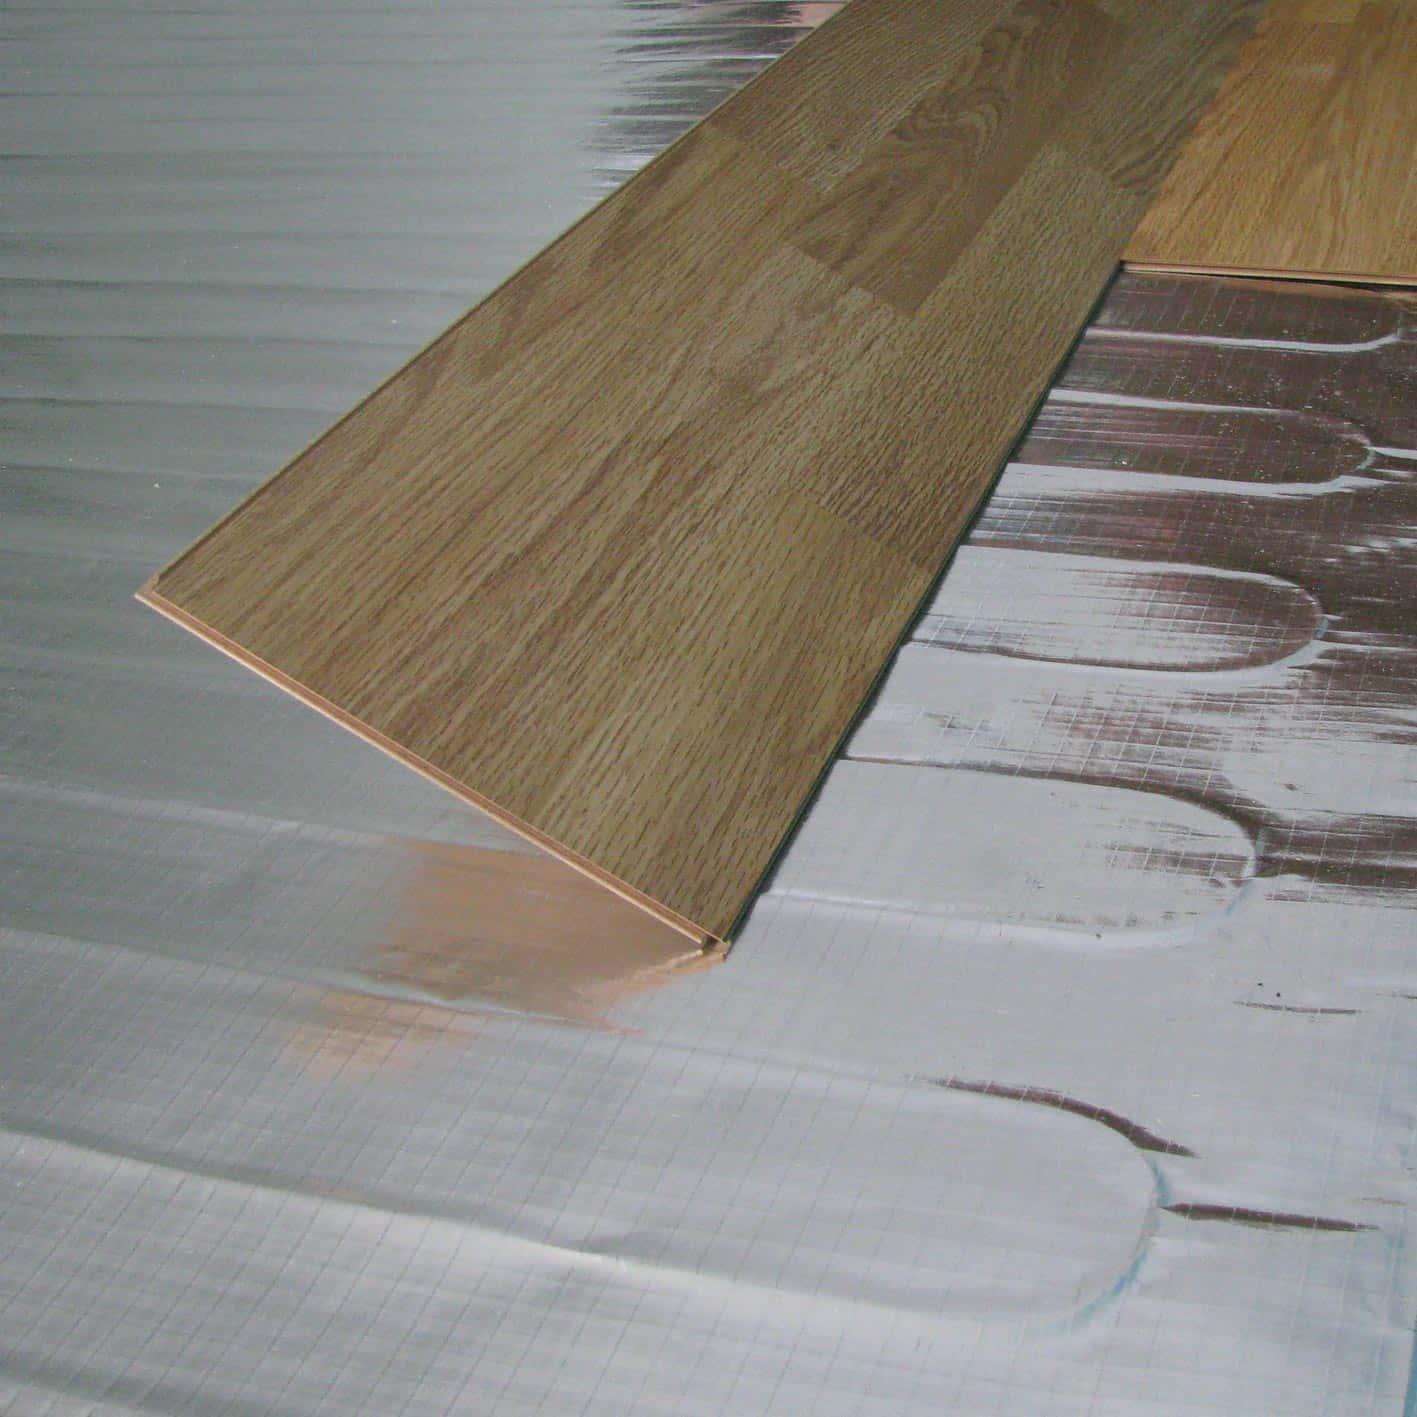 Under Wood Heating Under Laminate Heating Systems 150w